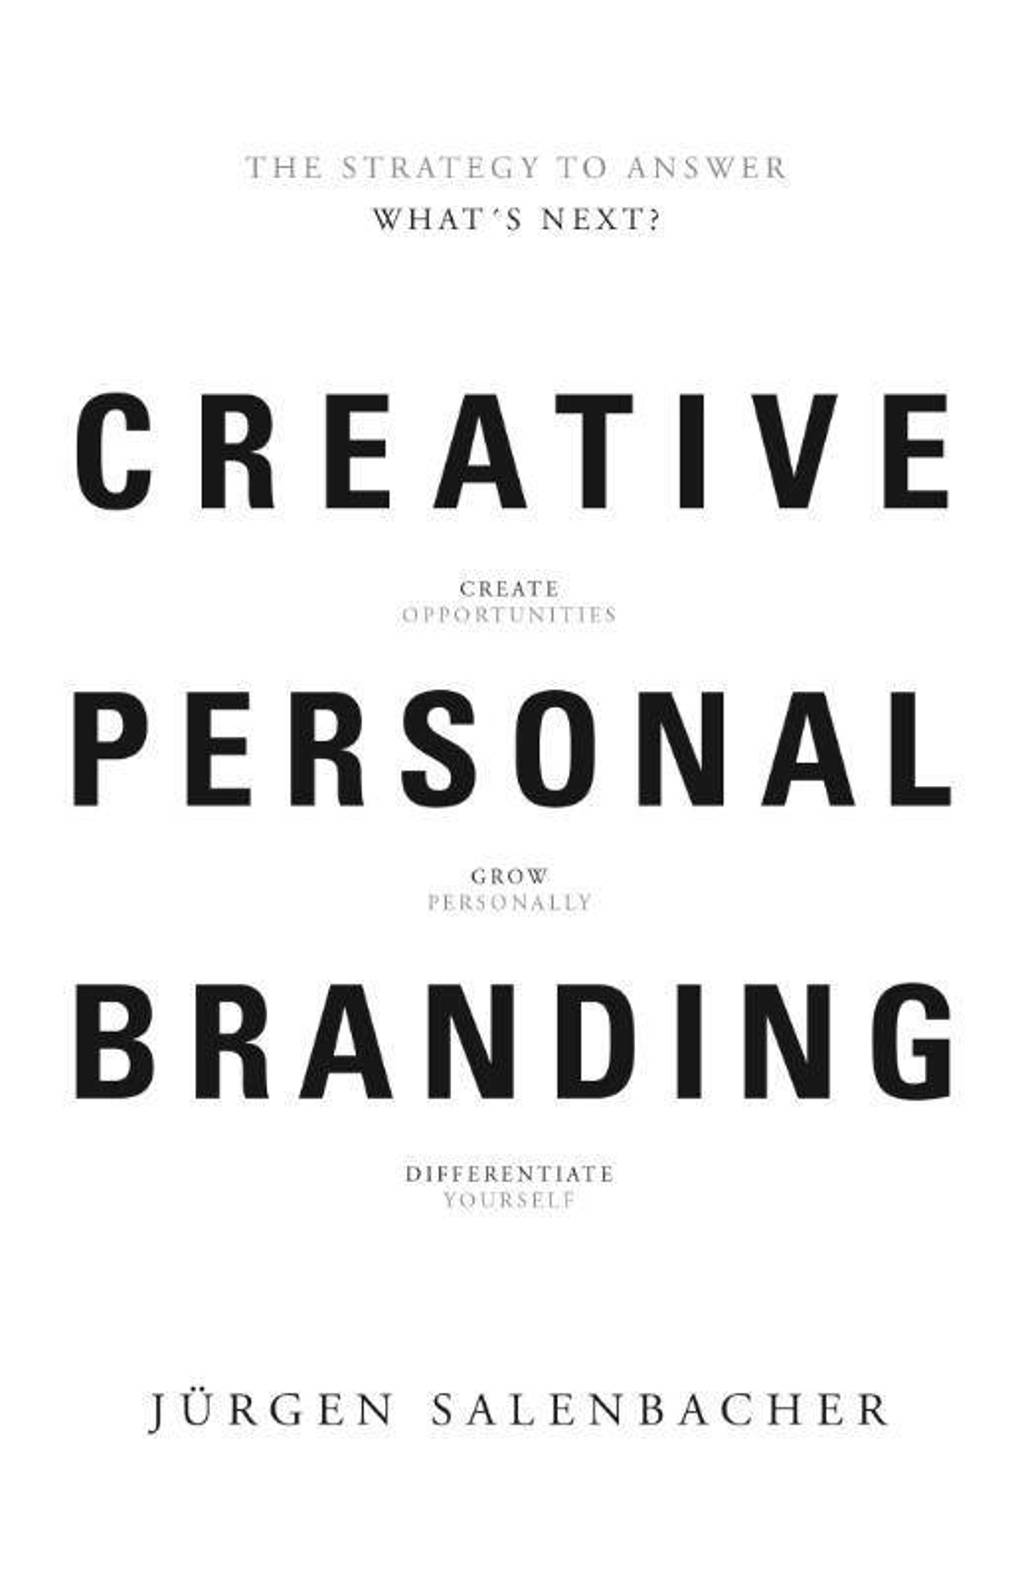 Creative personal branding - Jurgen Salenbacher